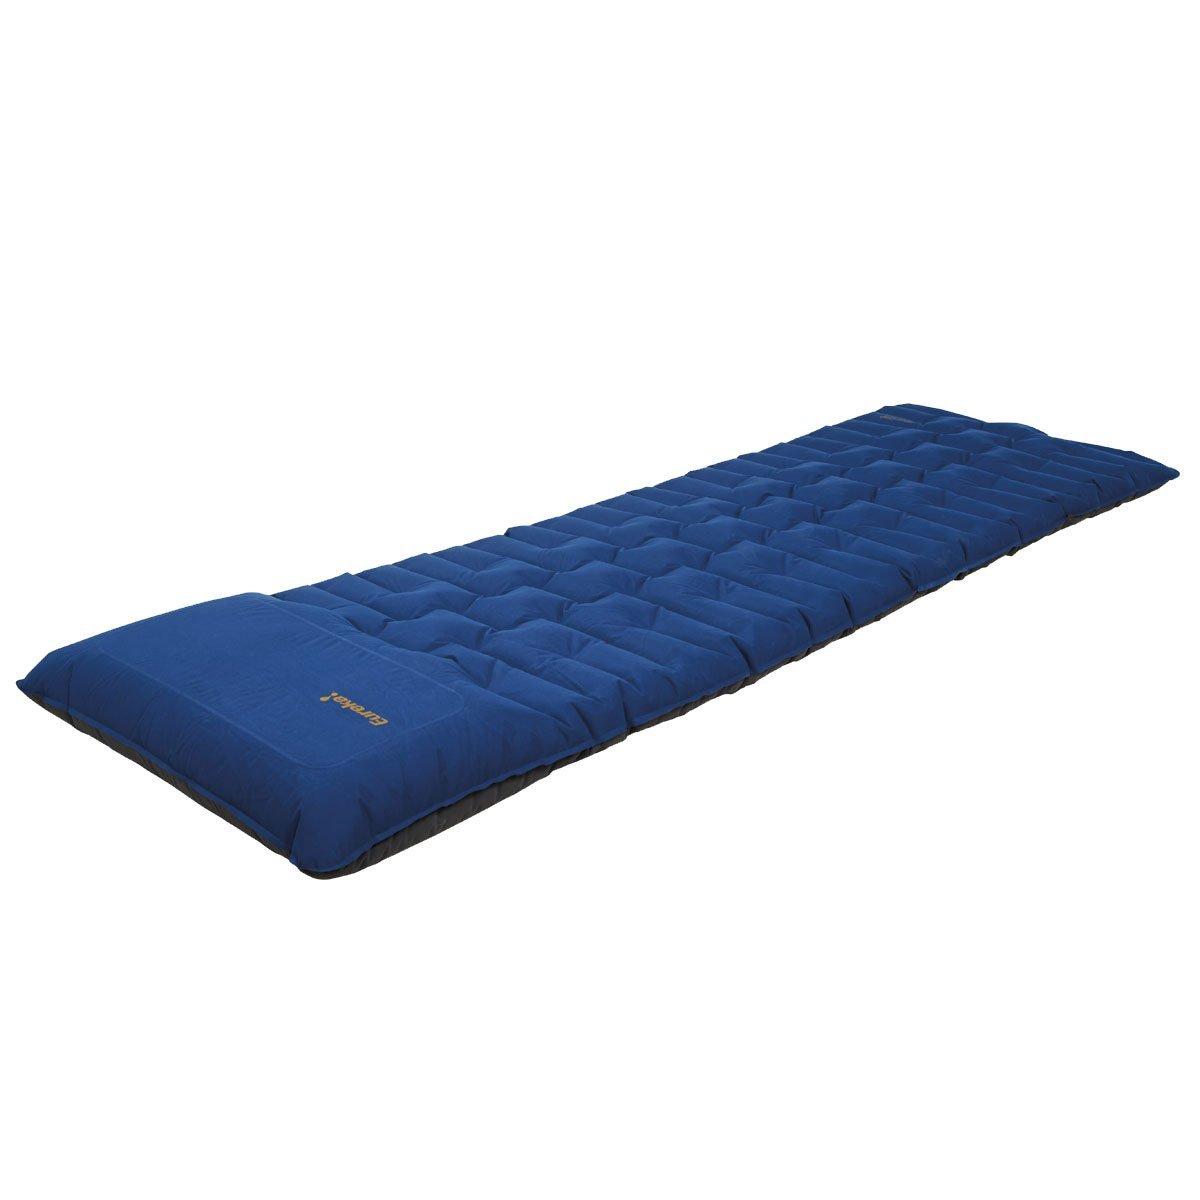 Eureka Super Cush Sleeping Pad B01NBPIK80  ブルー Large